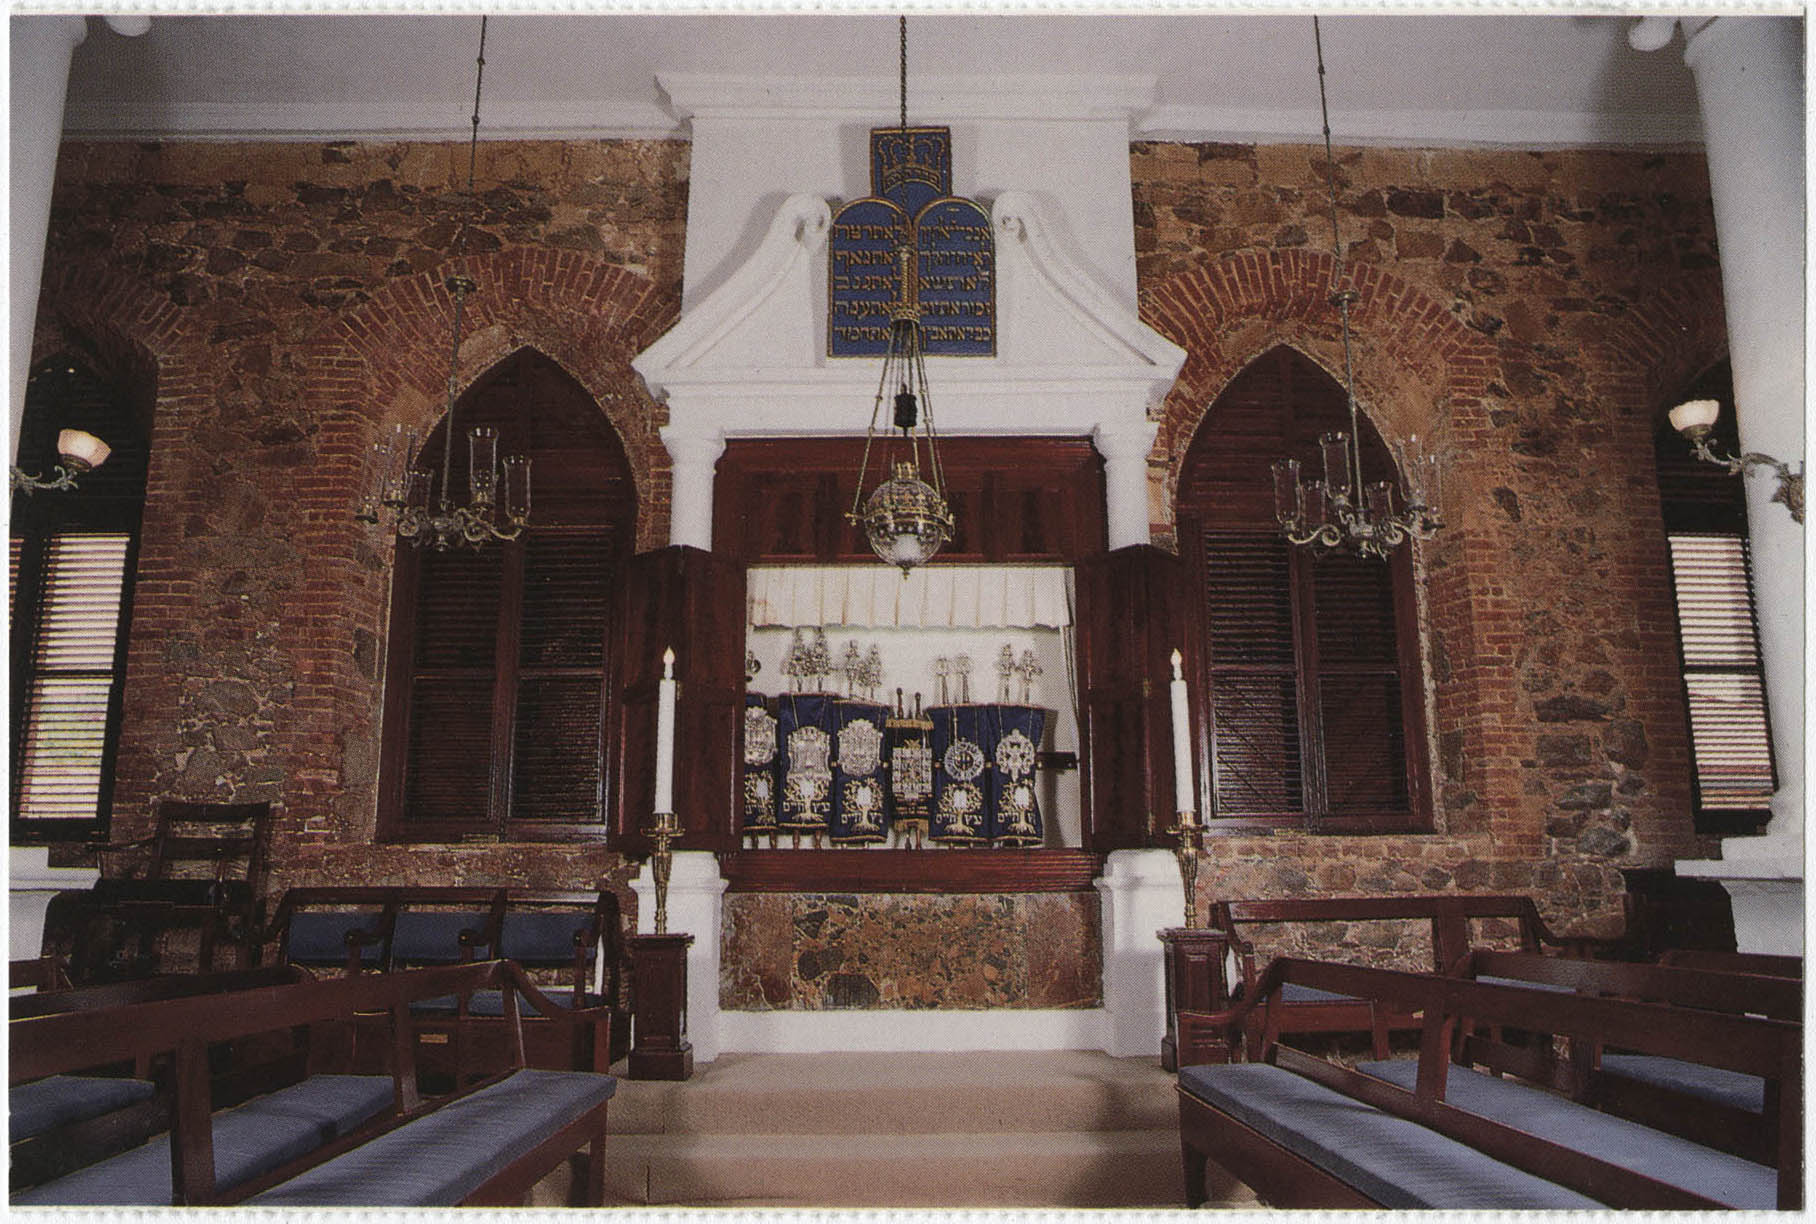 St. Thomas Synagogue, U.S. Virgin Islands